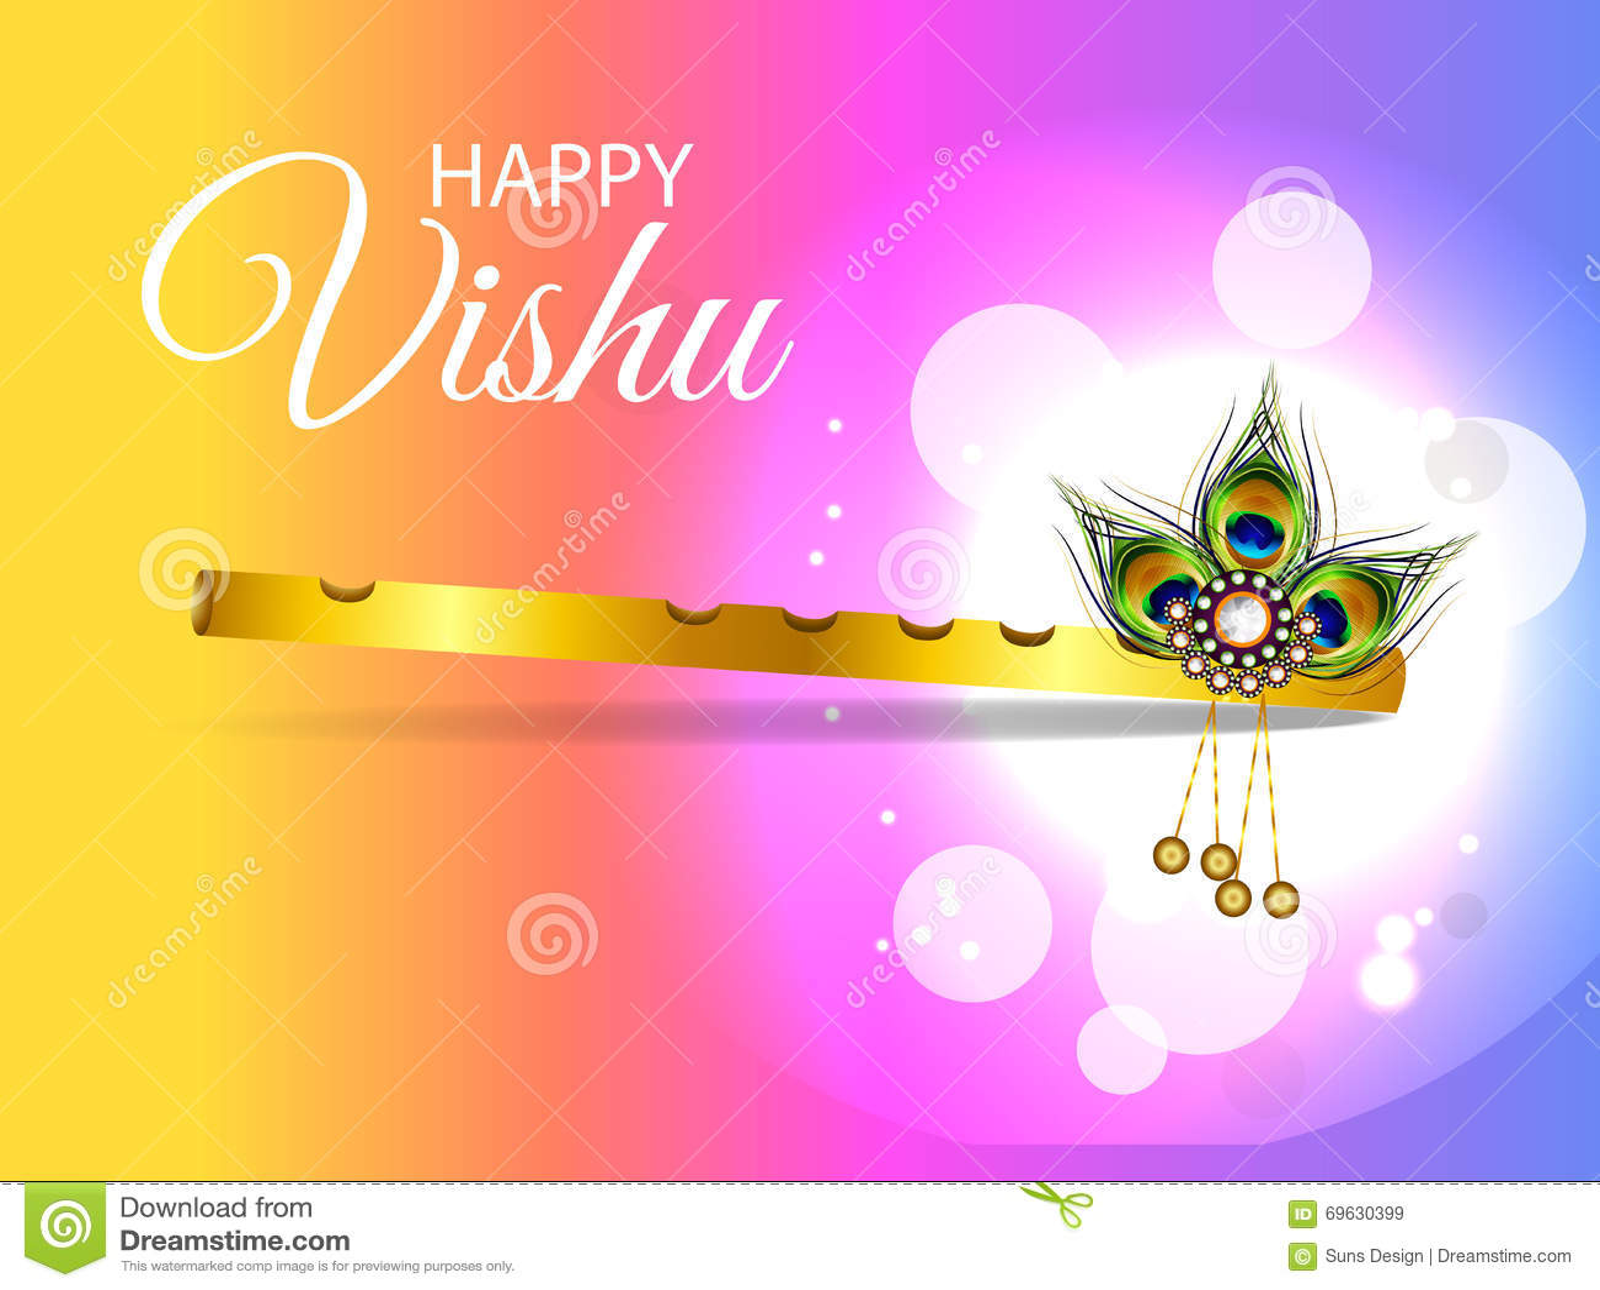 vishu pictures free download